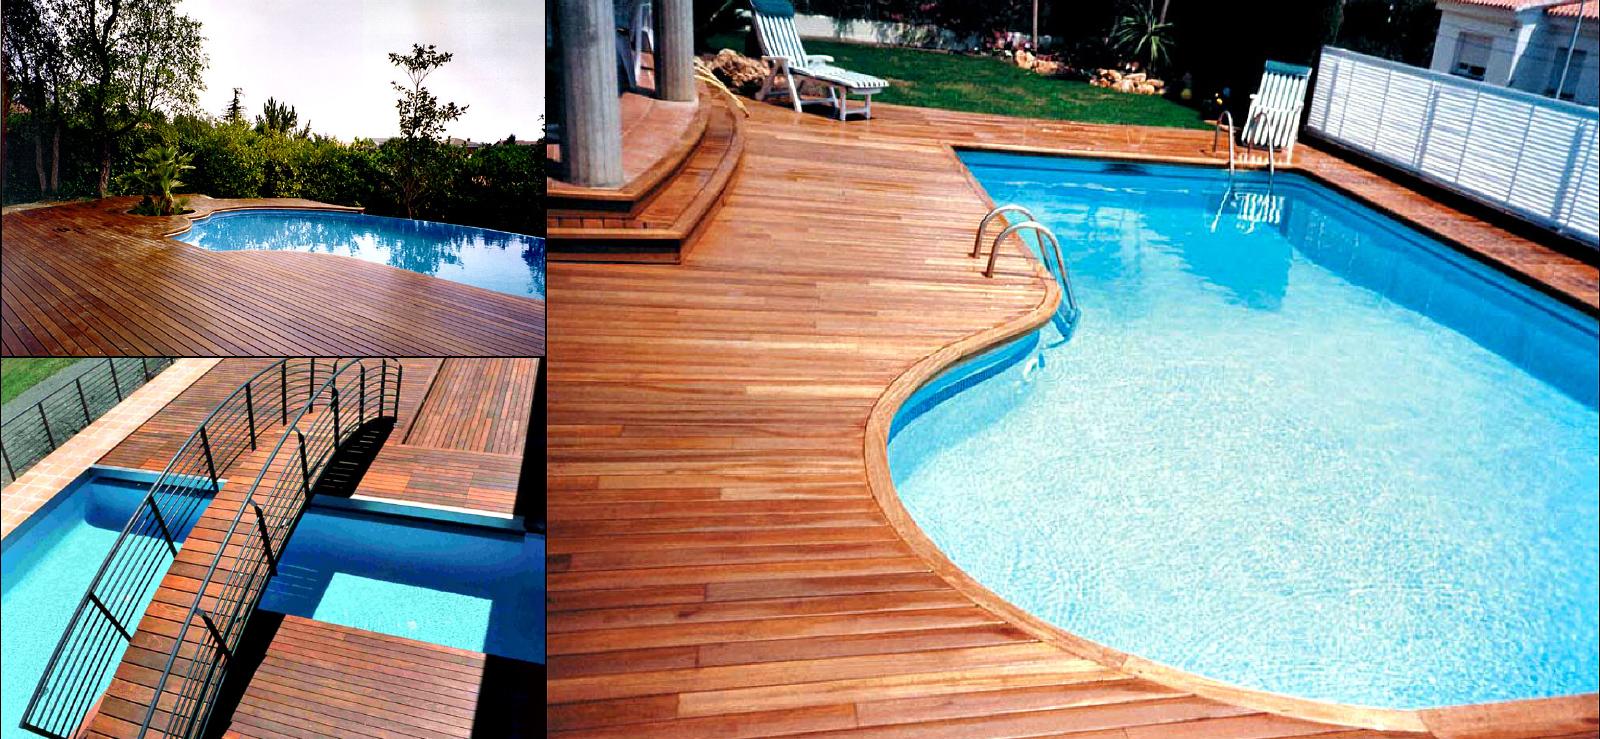 Decking And Pool Area Generis Woods